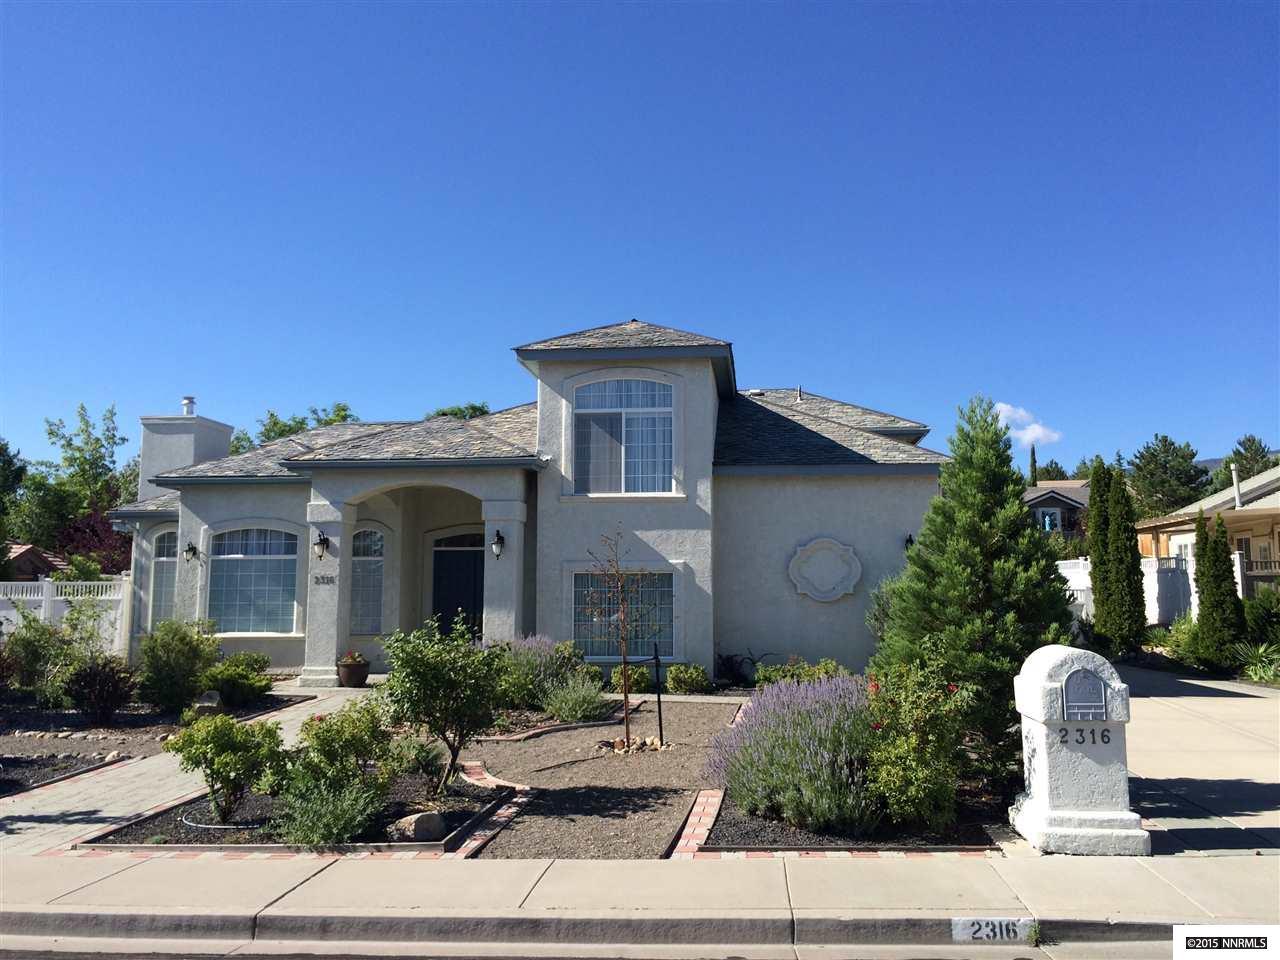 2316 Manzanita Ln, Reno, NV